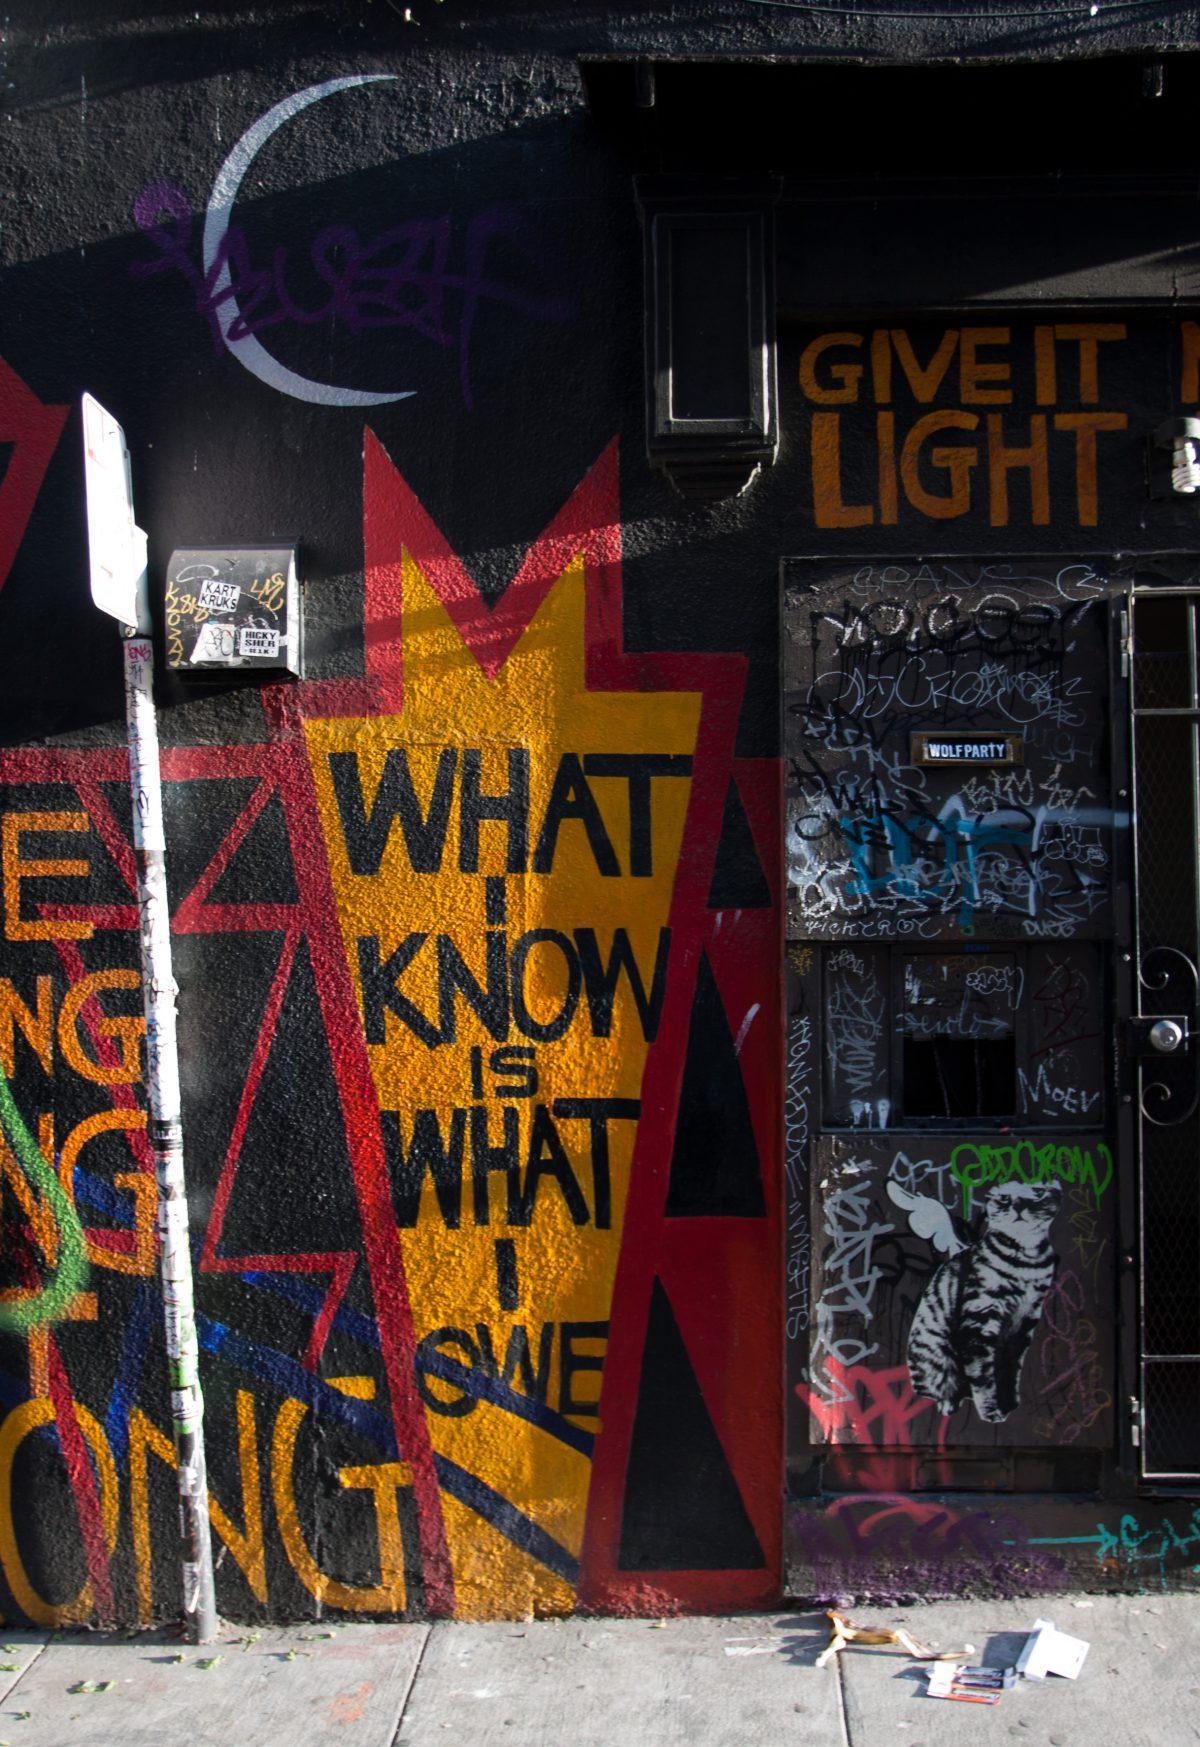 Back alley - around Misiion, graffiti